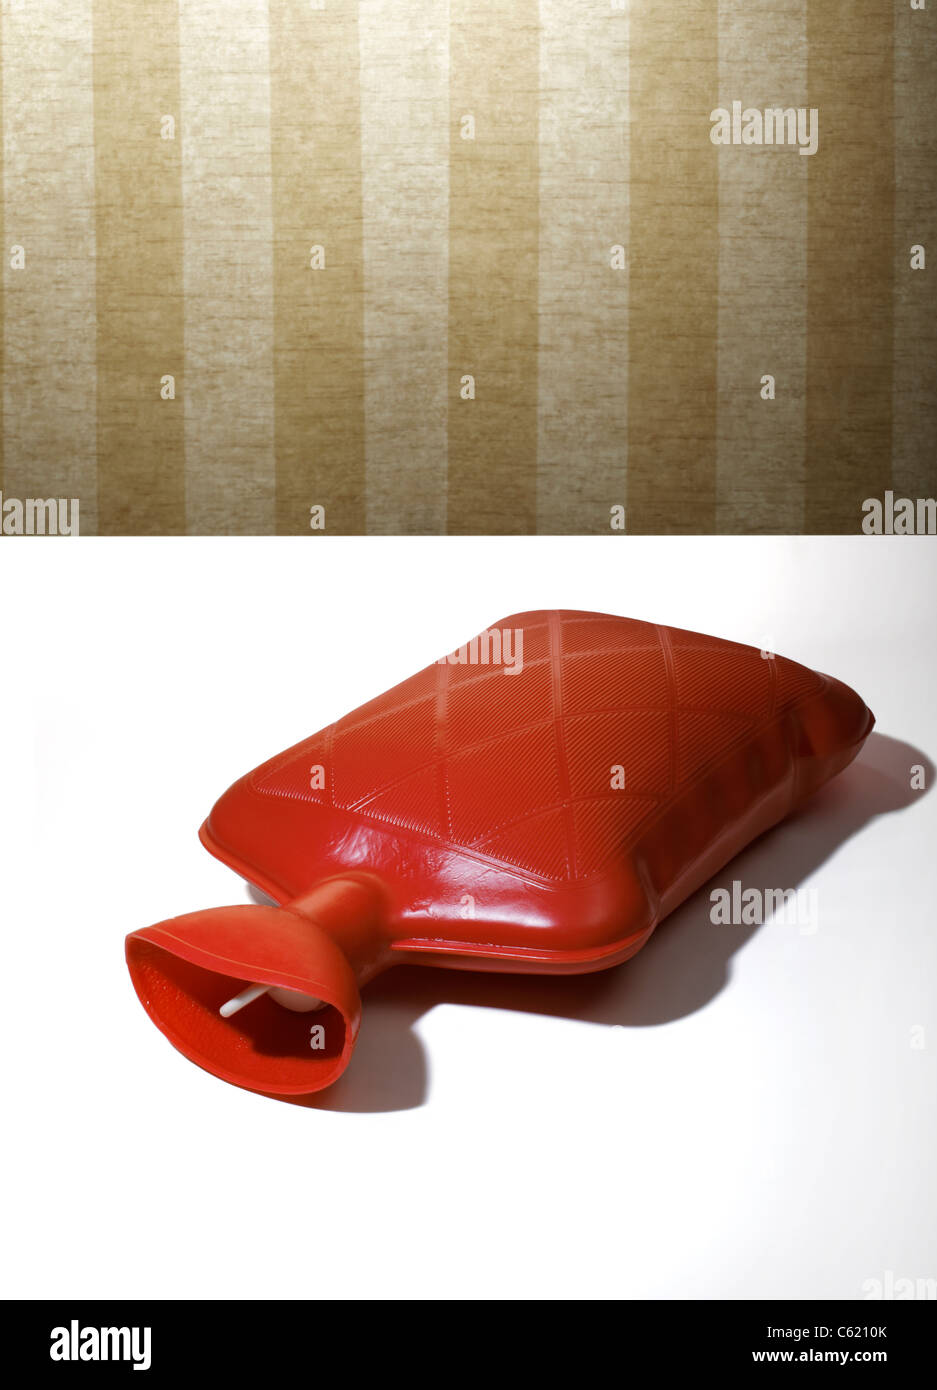 Hot Water bottle - Stock Image